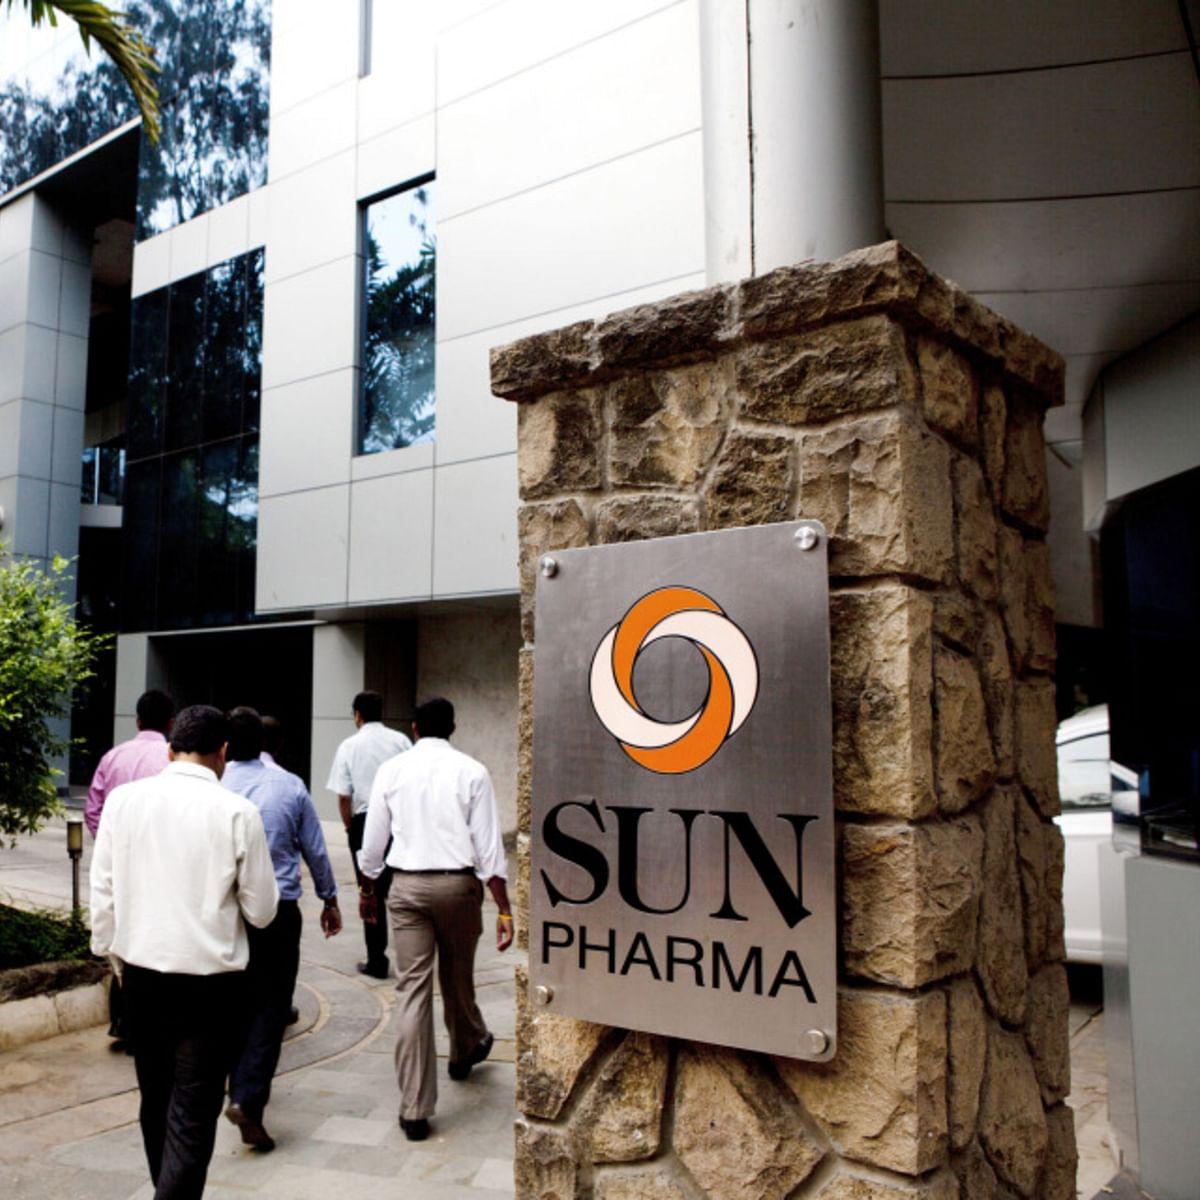 Sun Pharma Recalls Some Bottles Of Generic Diabetes Drug In U.S.